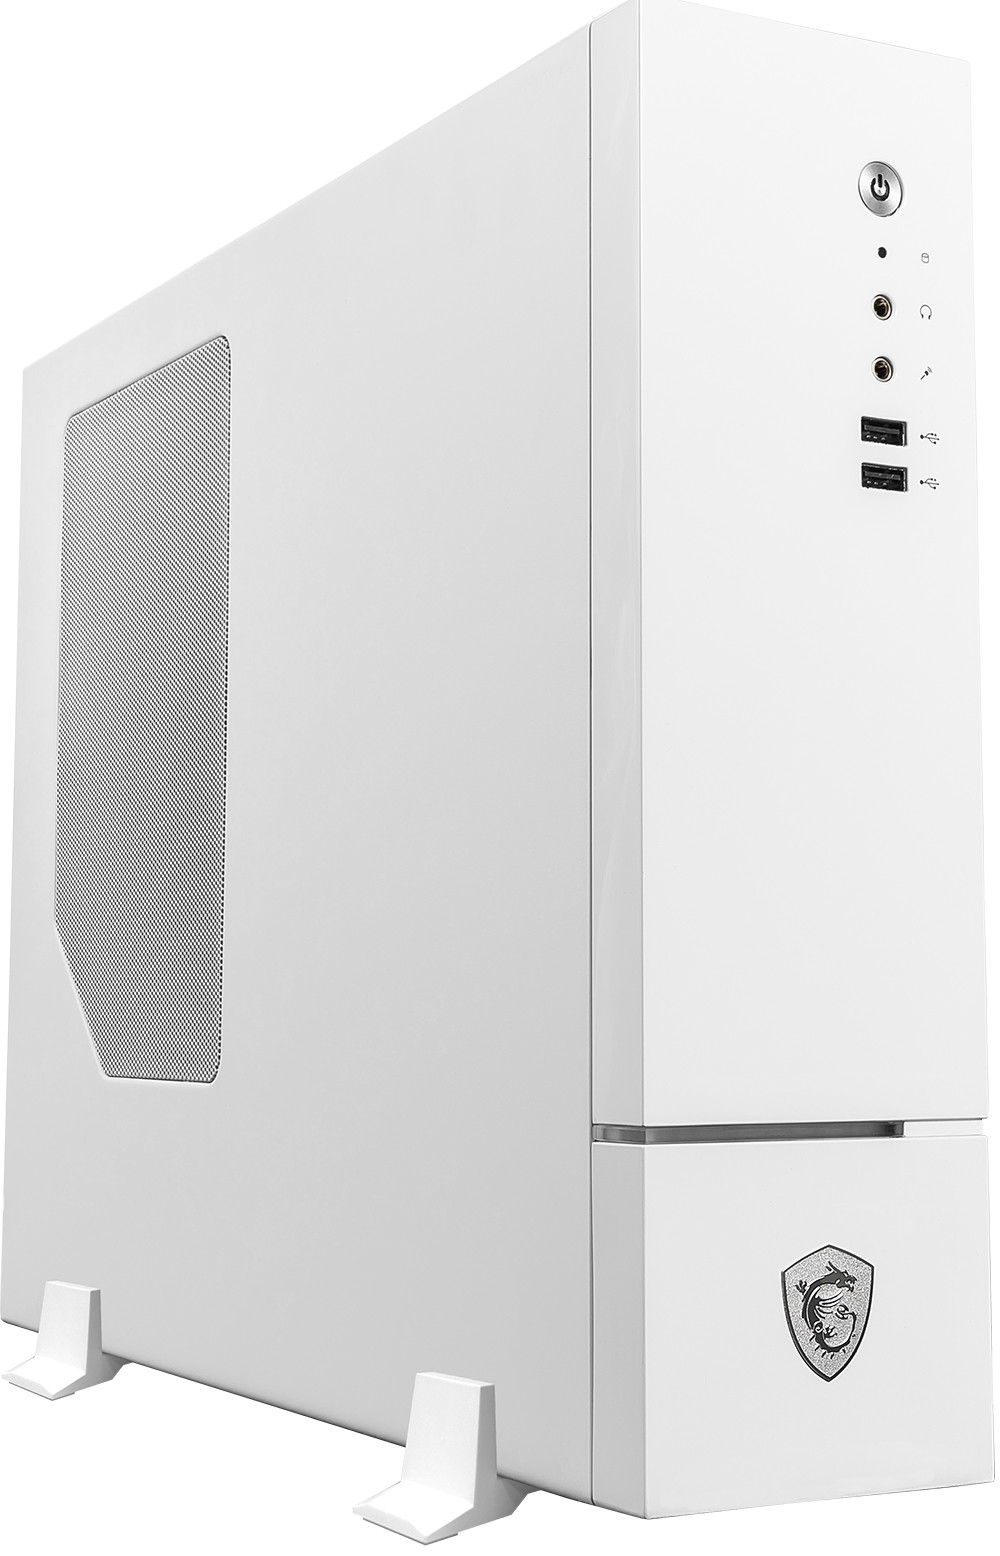 Компьютер MSI Prestige PE130 2,9GHz/8Gb…